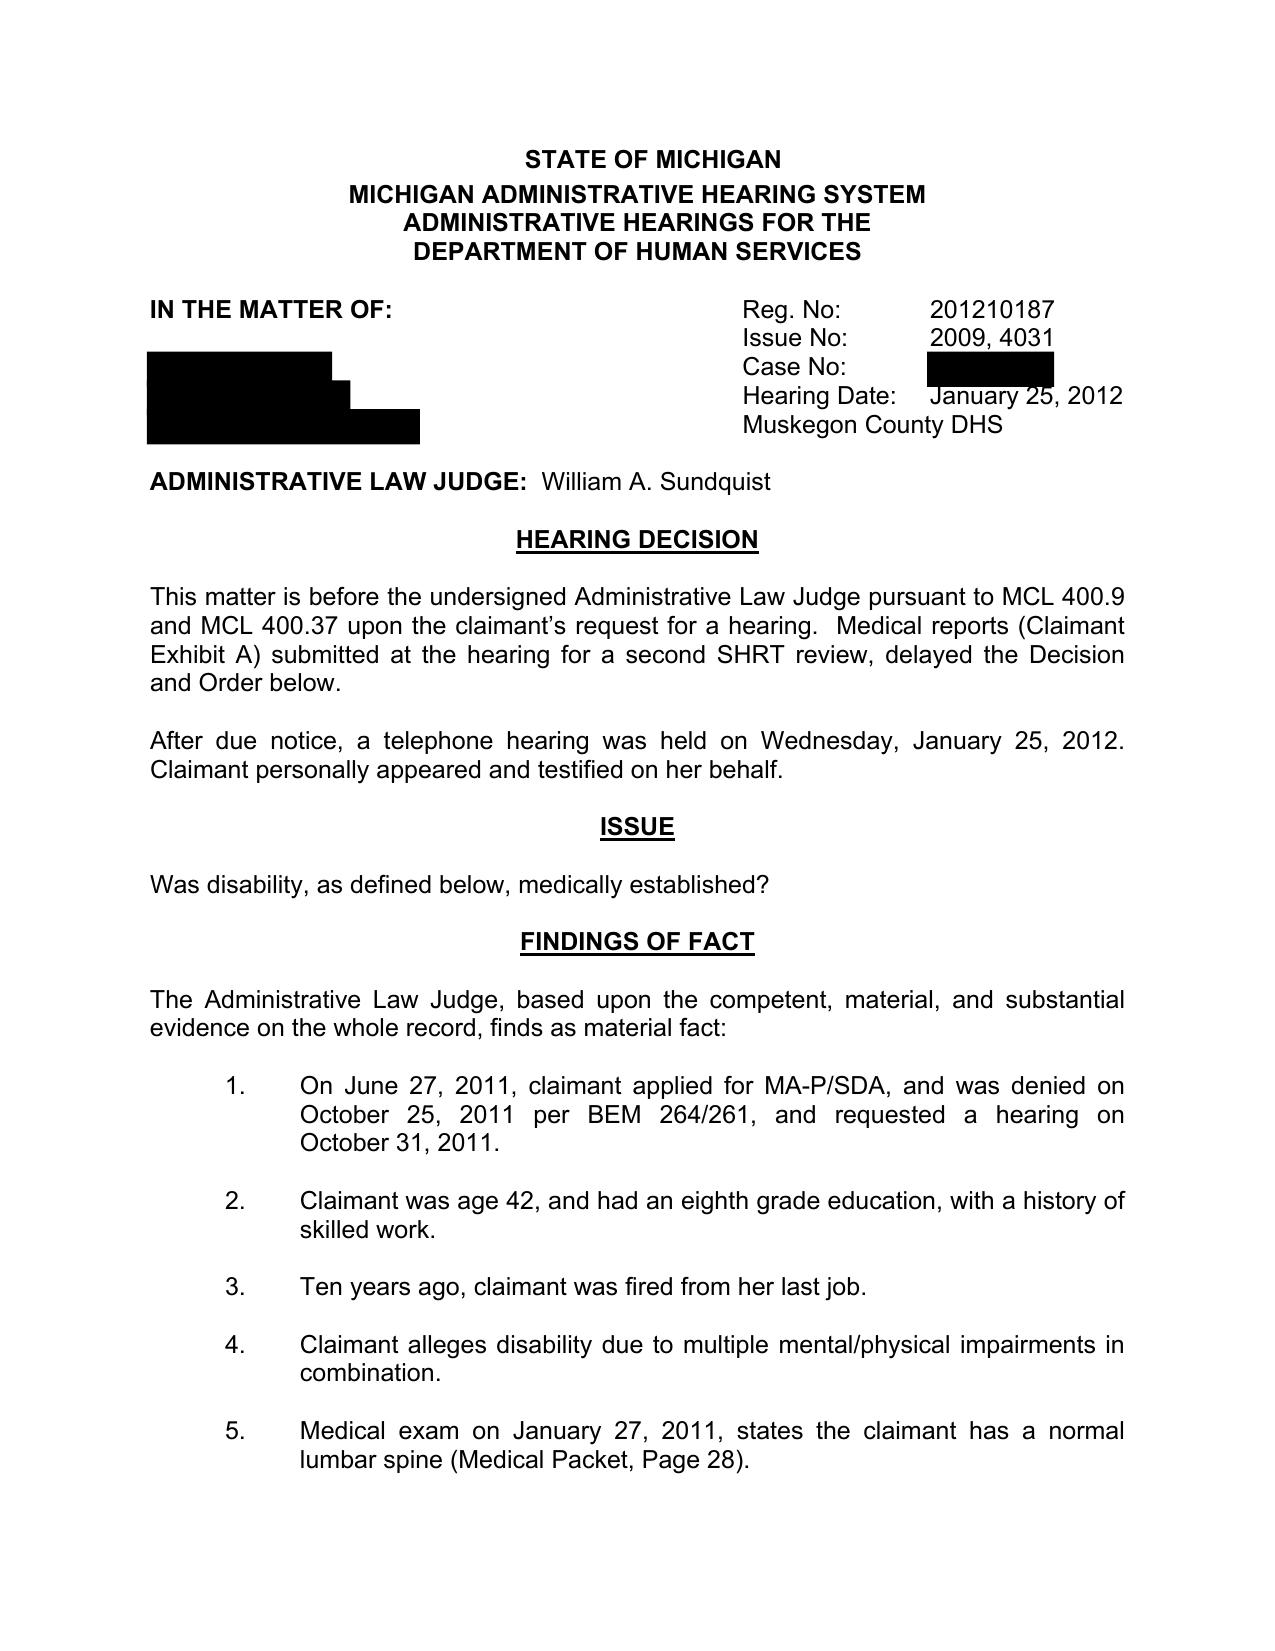 state of michigan michigan administrative hearing system